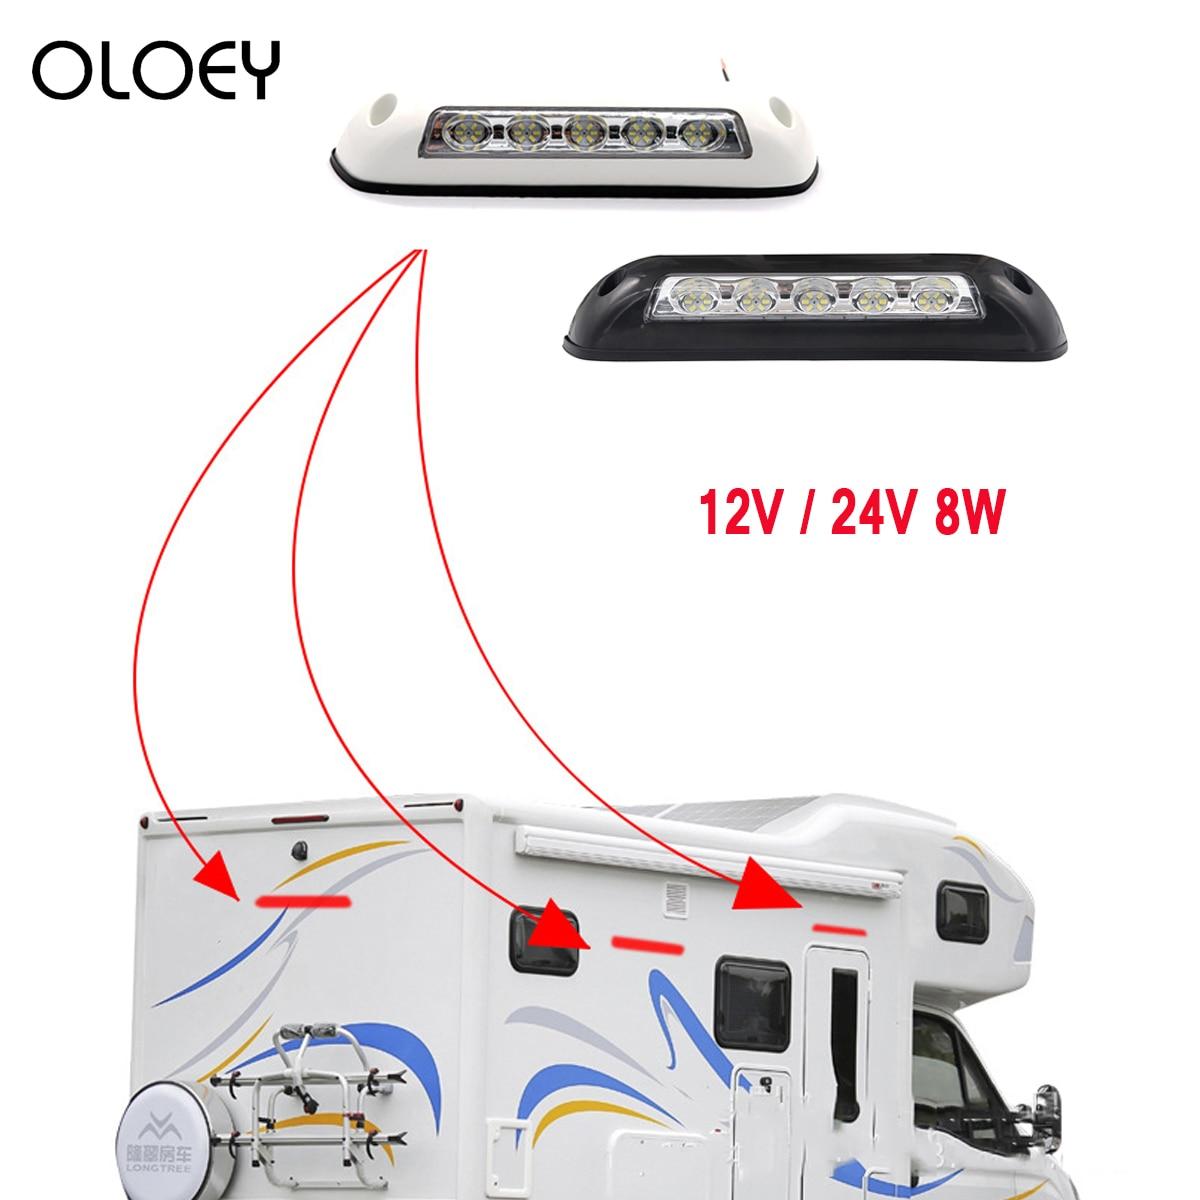 12V 24V 8W RV LED Luifel Veranda Licht Waterdichte Camper Caravan Interieur Muur Lampen Licht Bar Van camper Trailer Exterieur Lamp